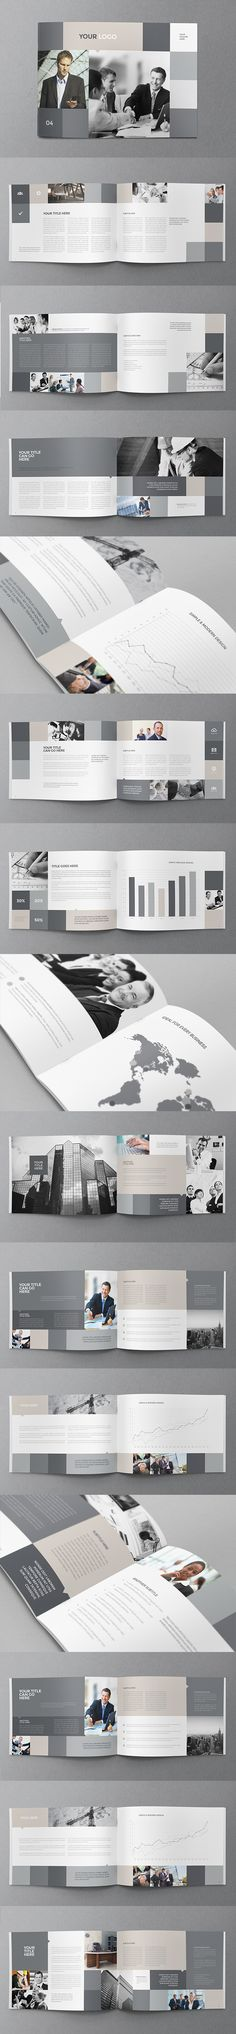 Brochure Inspiration, Graphic Design Inspiration, Design Brochure, Branding Design, Brochure Template, Graphic Design Books, Book Design, Editorial Layout, Editorial Design